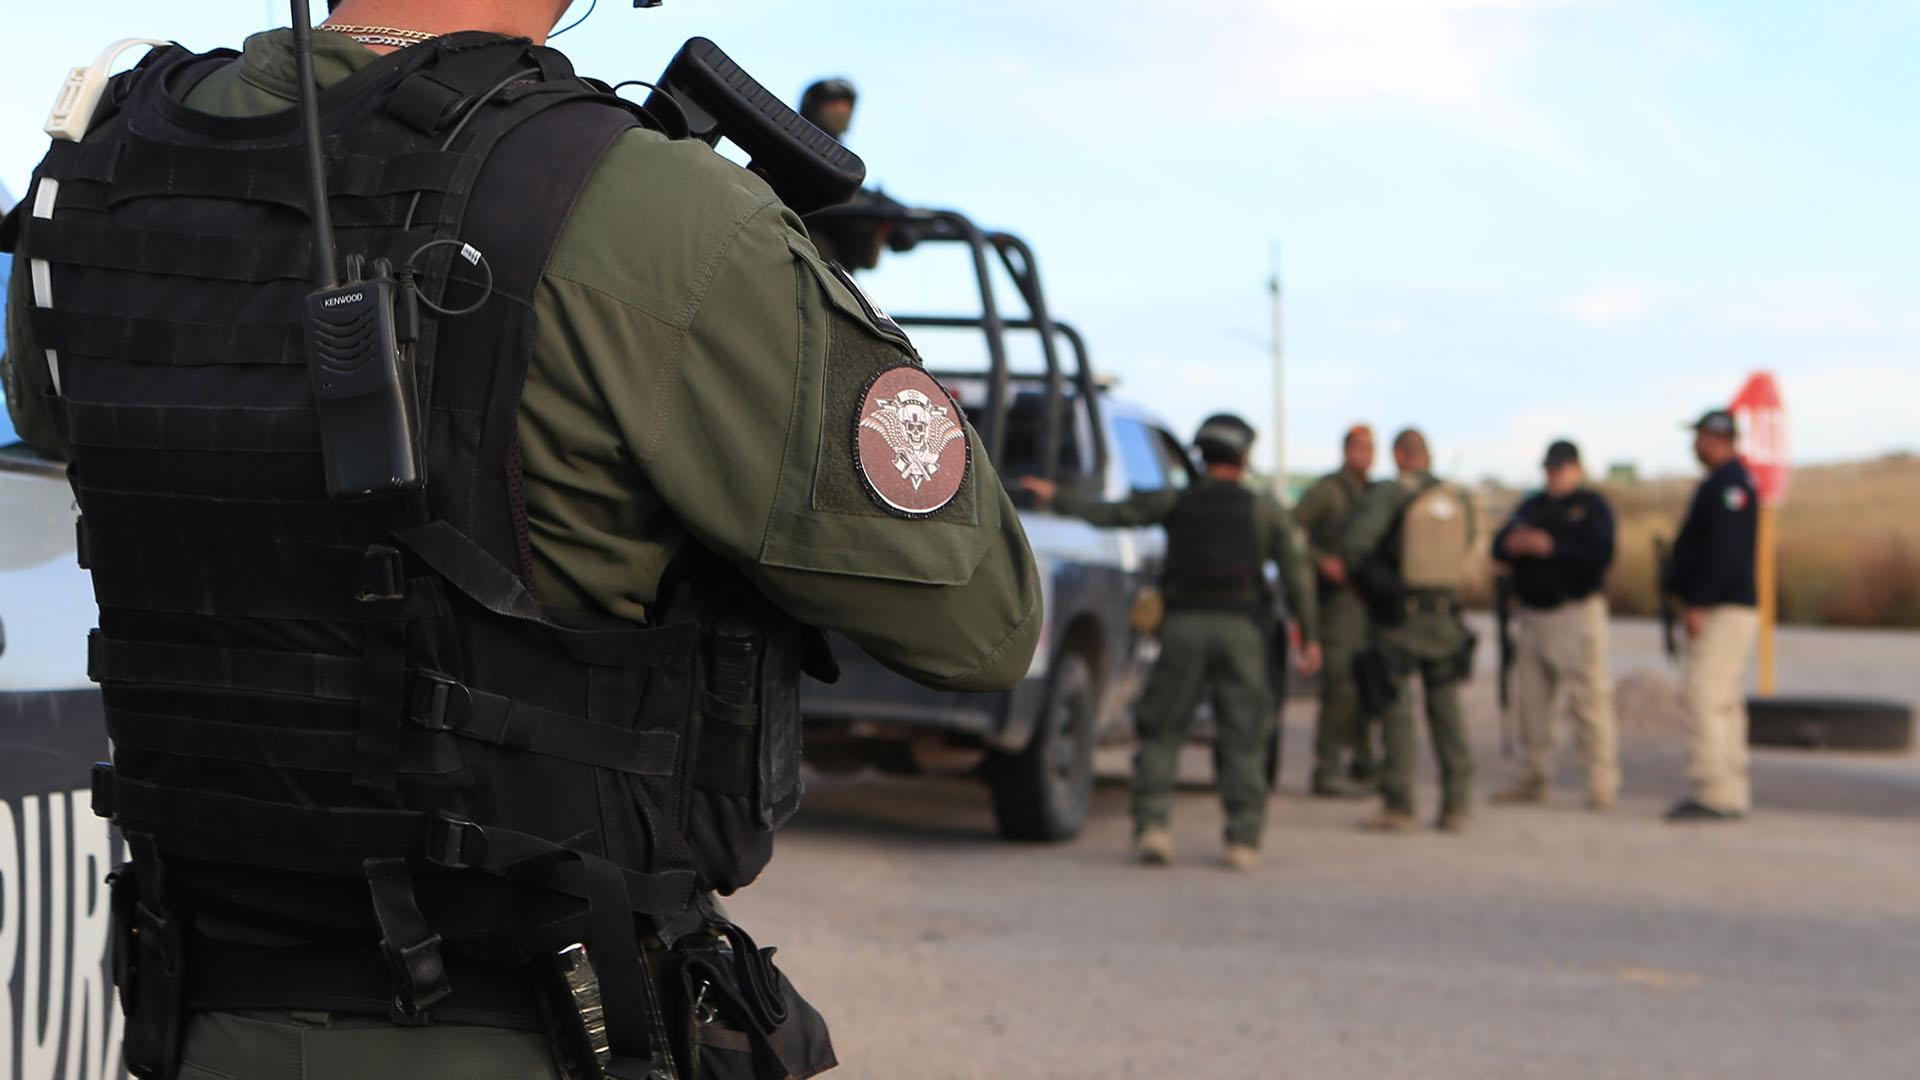 Ataque a familia LeBarón estaría relacionado con enfrentamientos en Agua Prieta - López-Dóriga